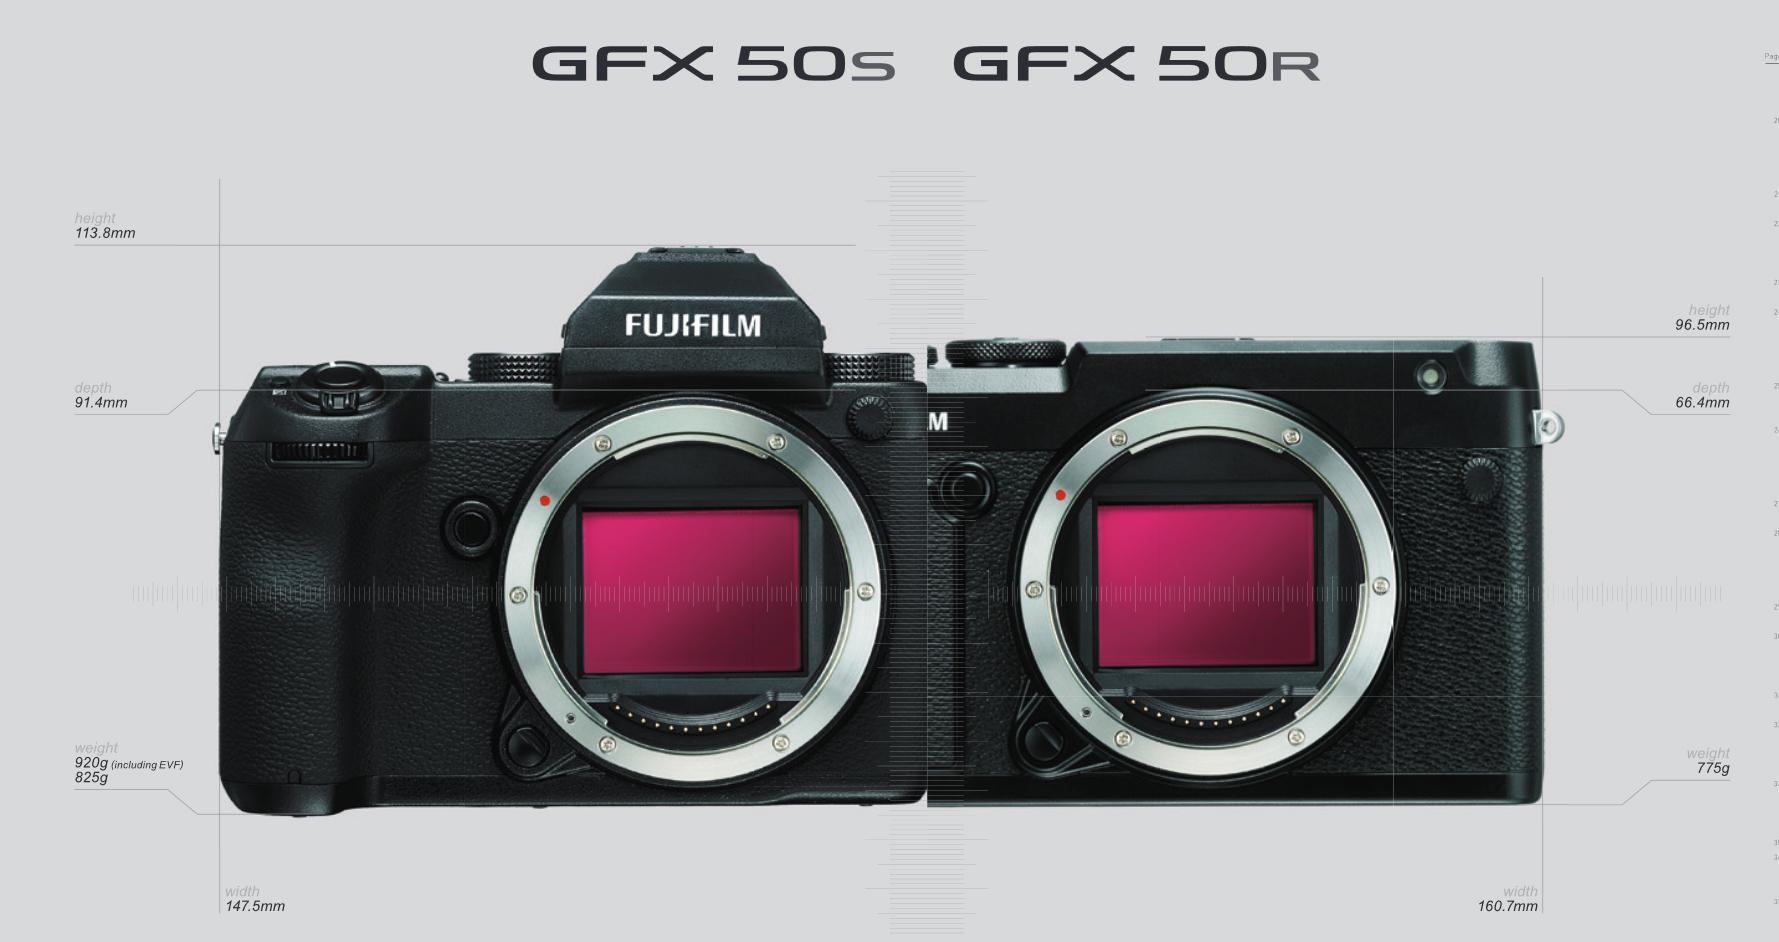 Размеры Fujifilm GFX 50R и Fujifilm GFX 50S